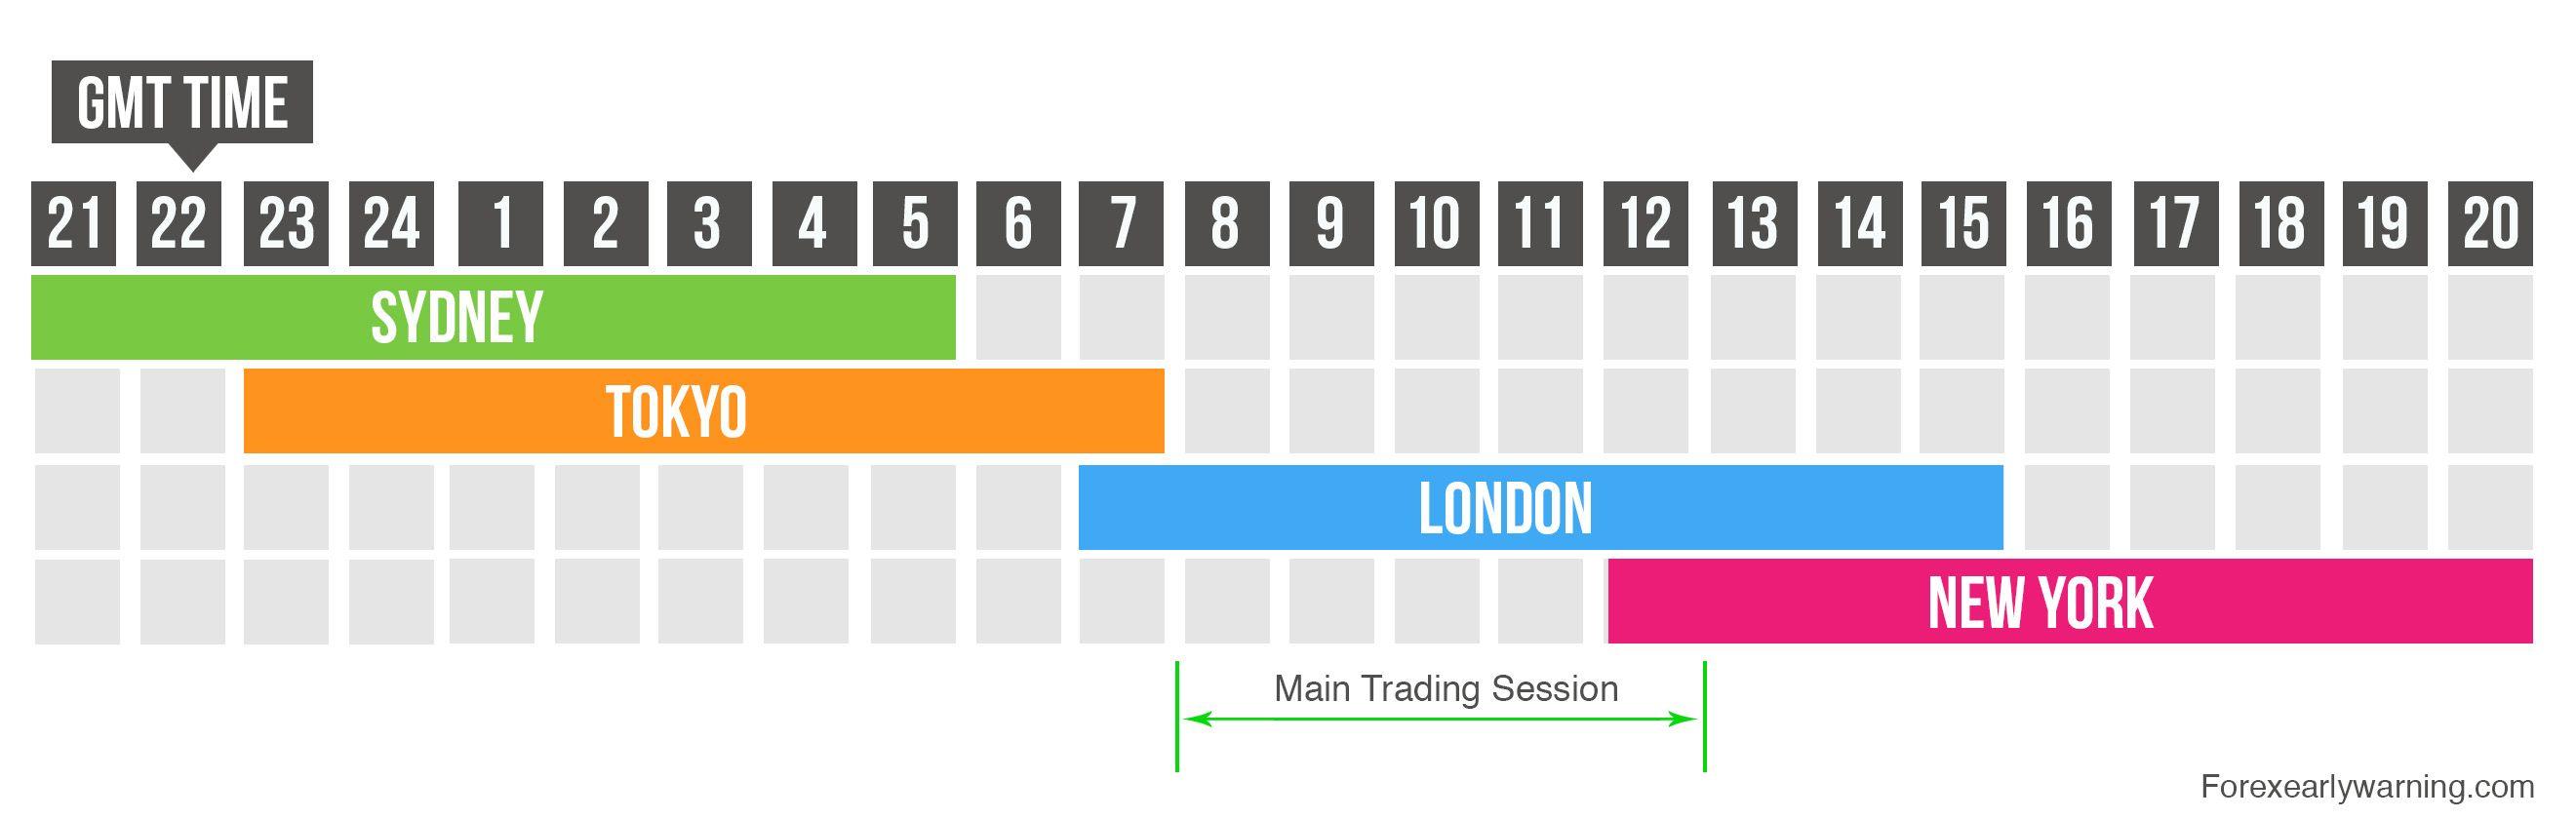 Miglior trader opzioni binarie pamela rossi - mainighlehan's blog